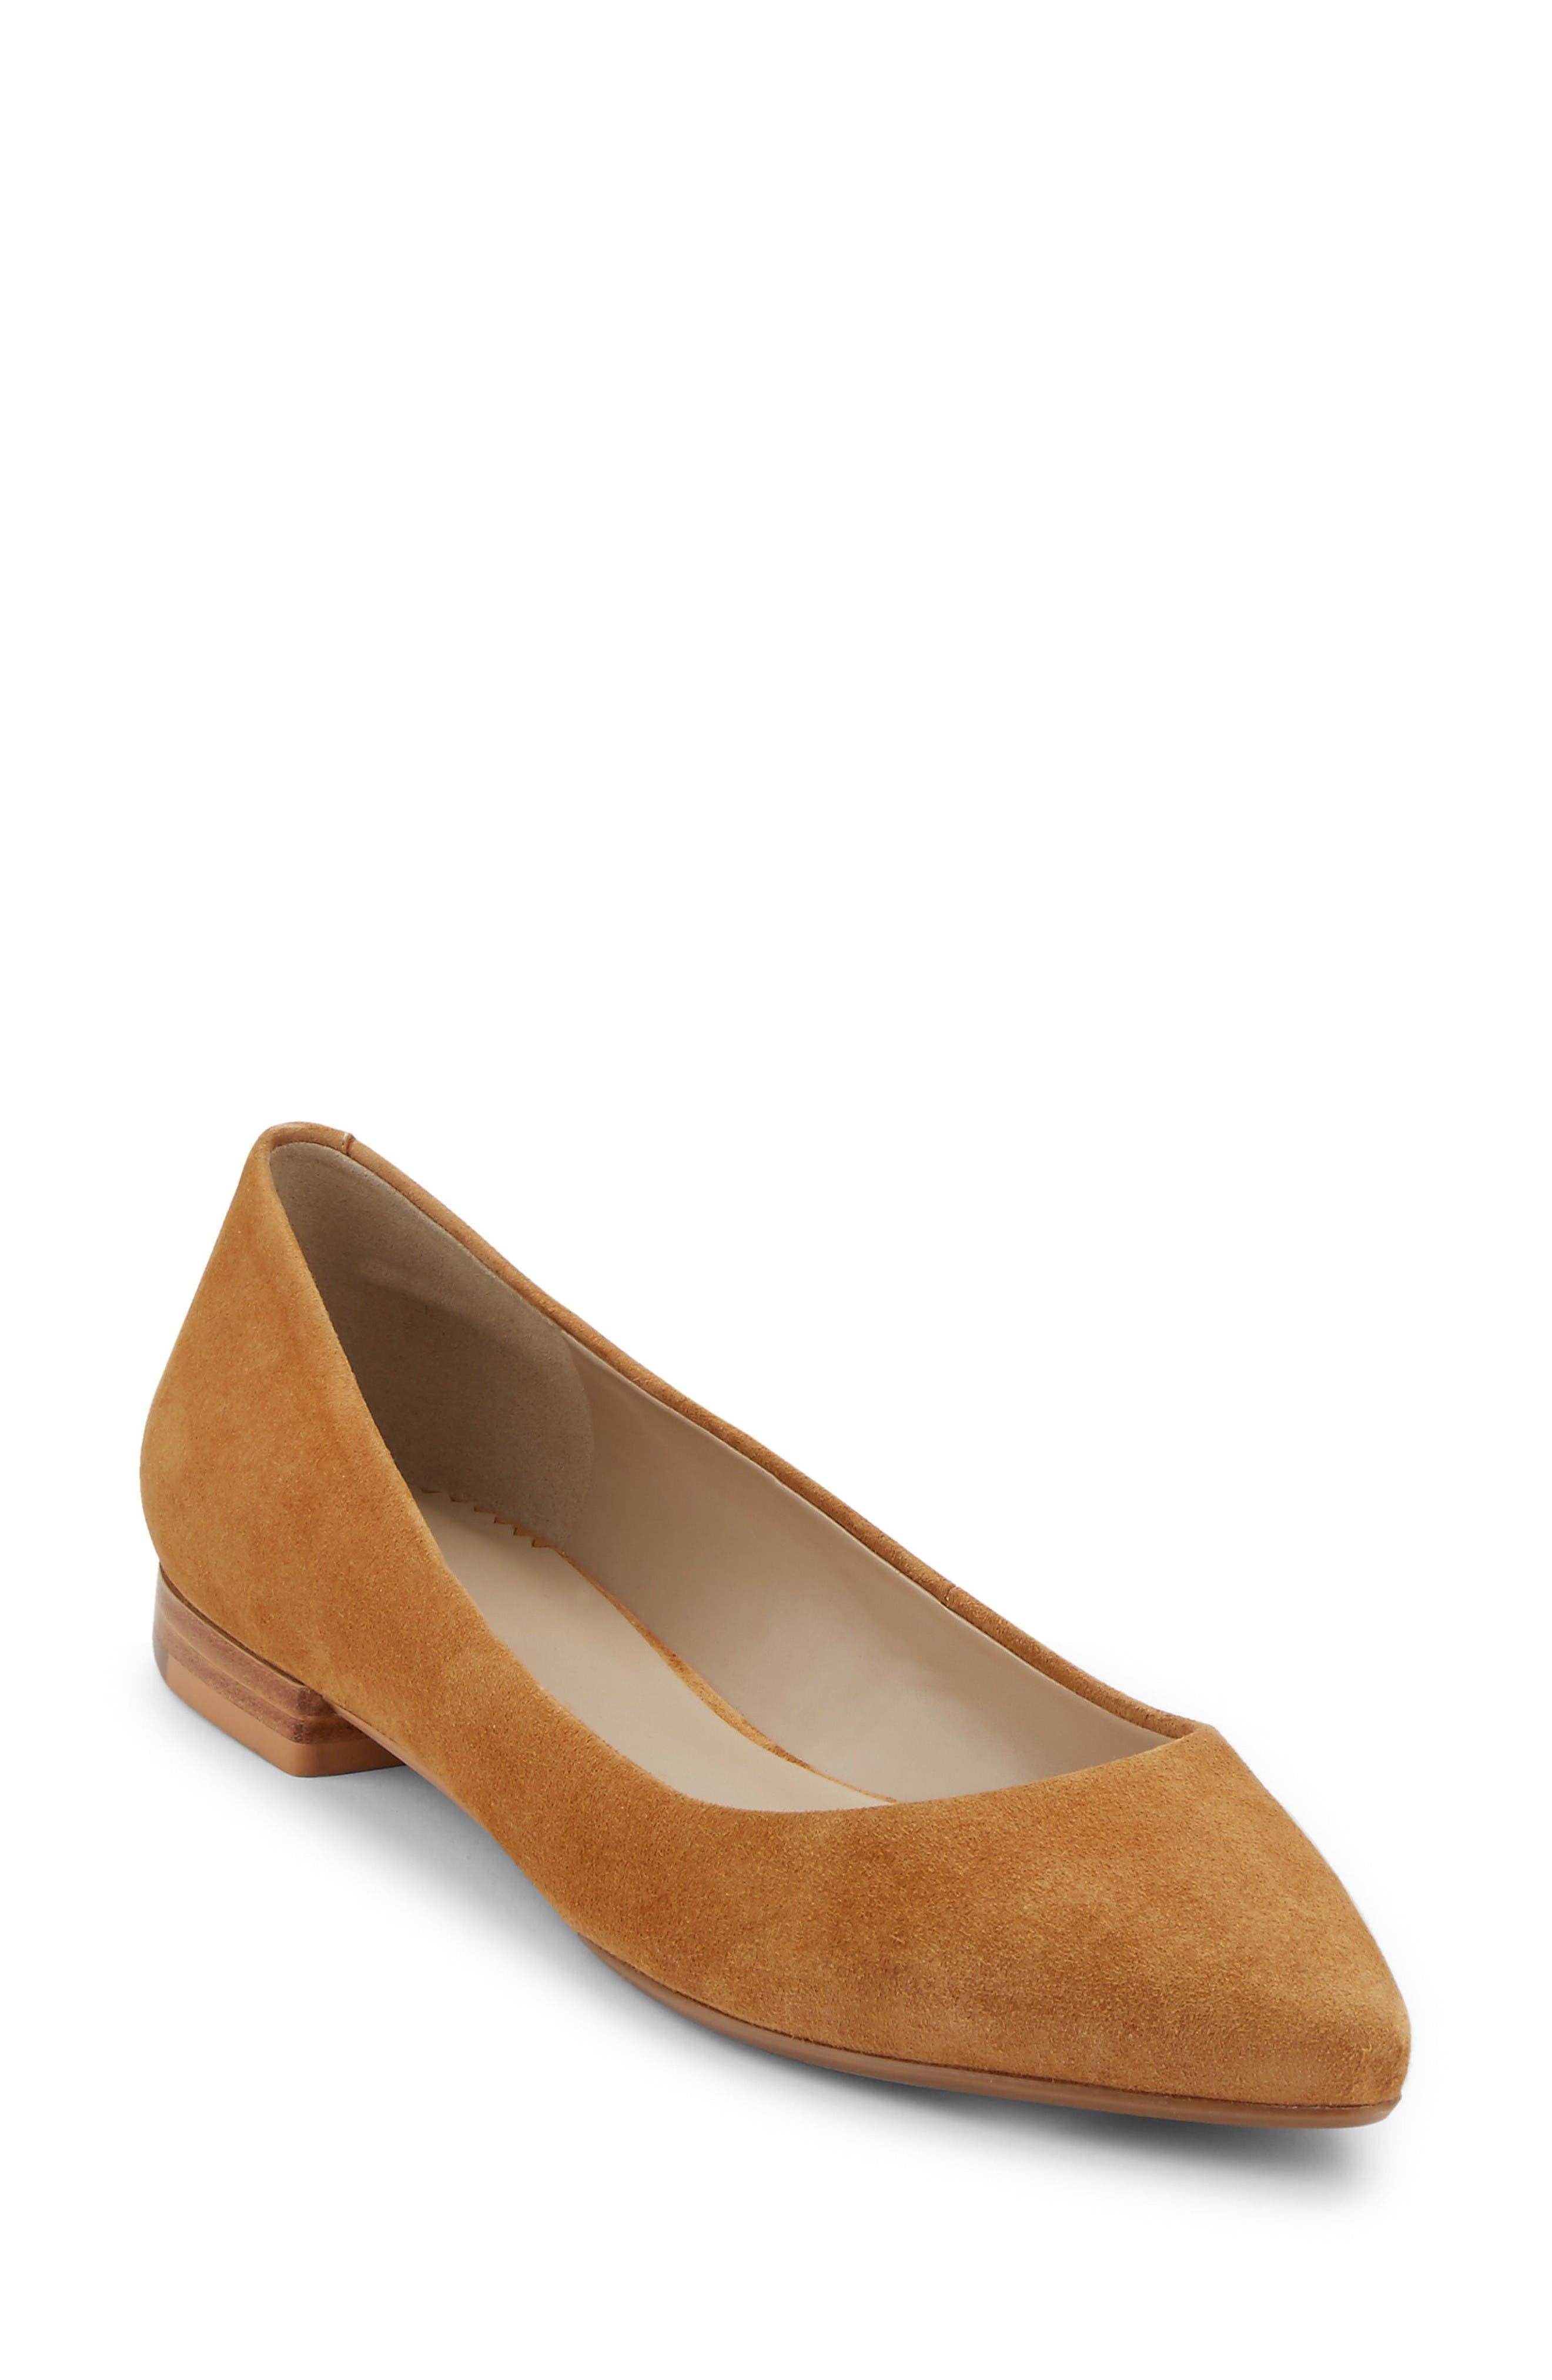 Alternate Image 1 Selected - G.H. Bass & Co. Kayla Pointy Toe Flat (Women)